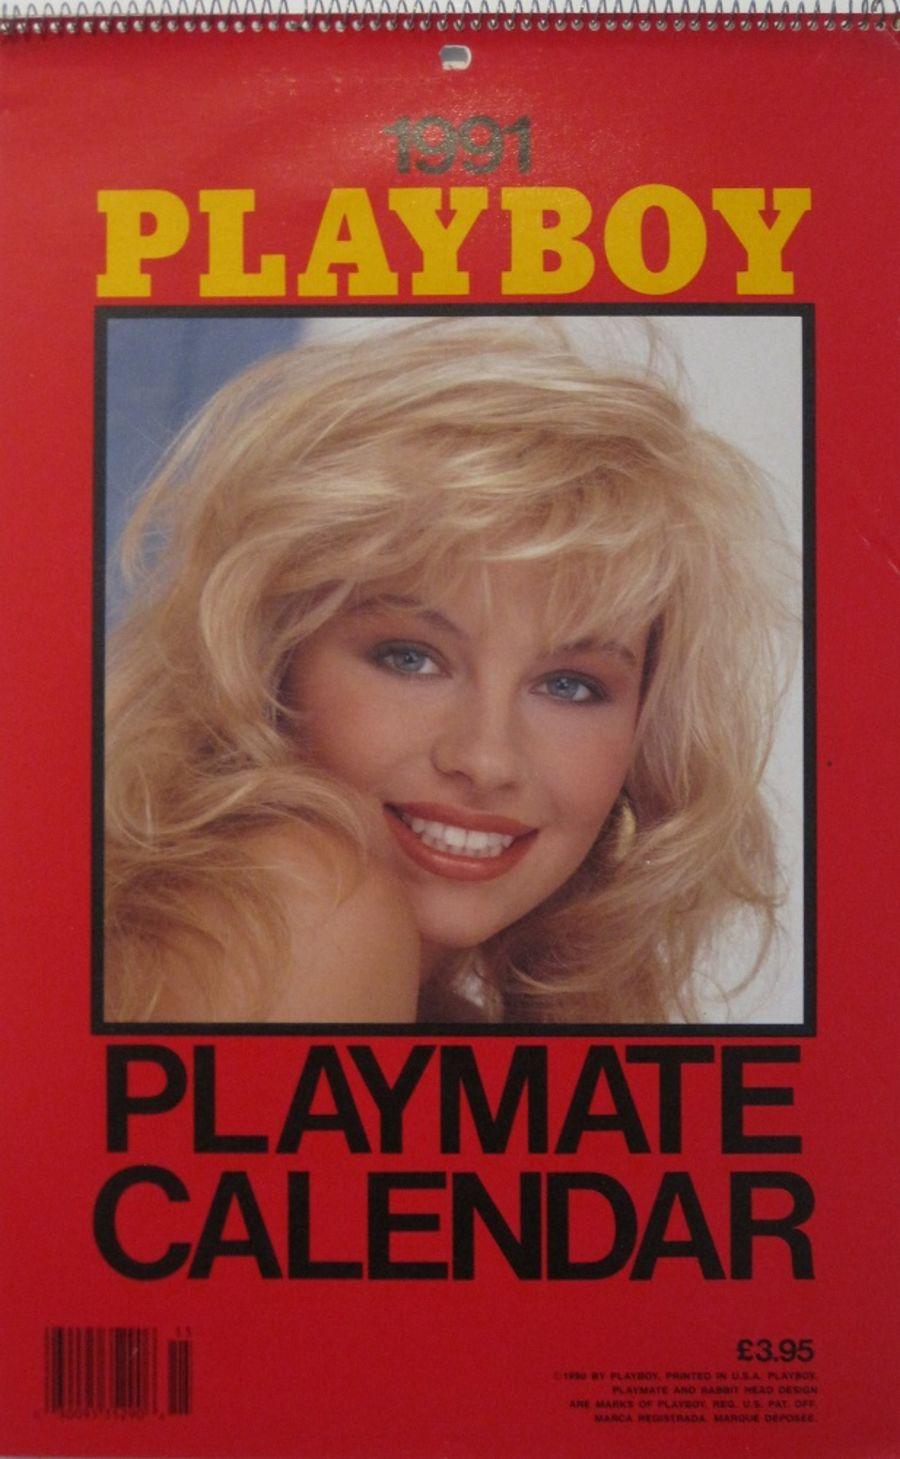 PLAYBOY PLAYMATE CALENDAR. 1991.